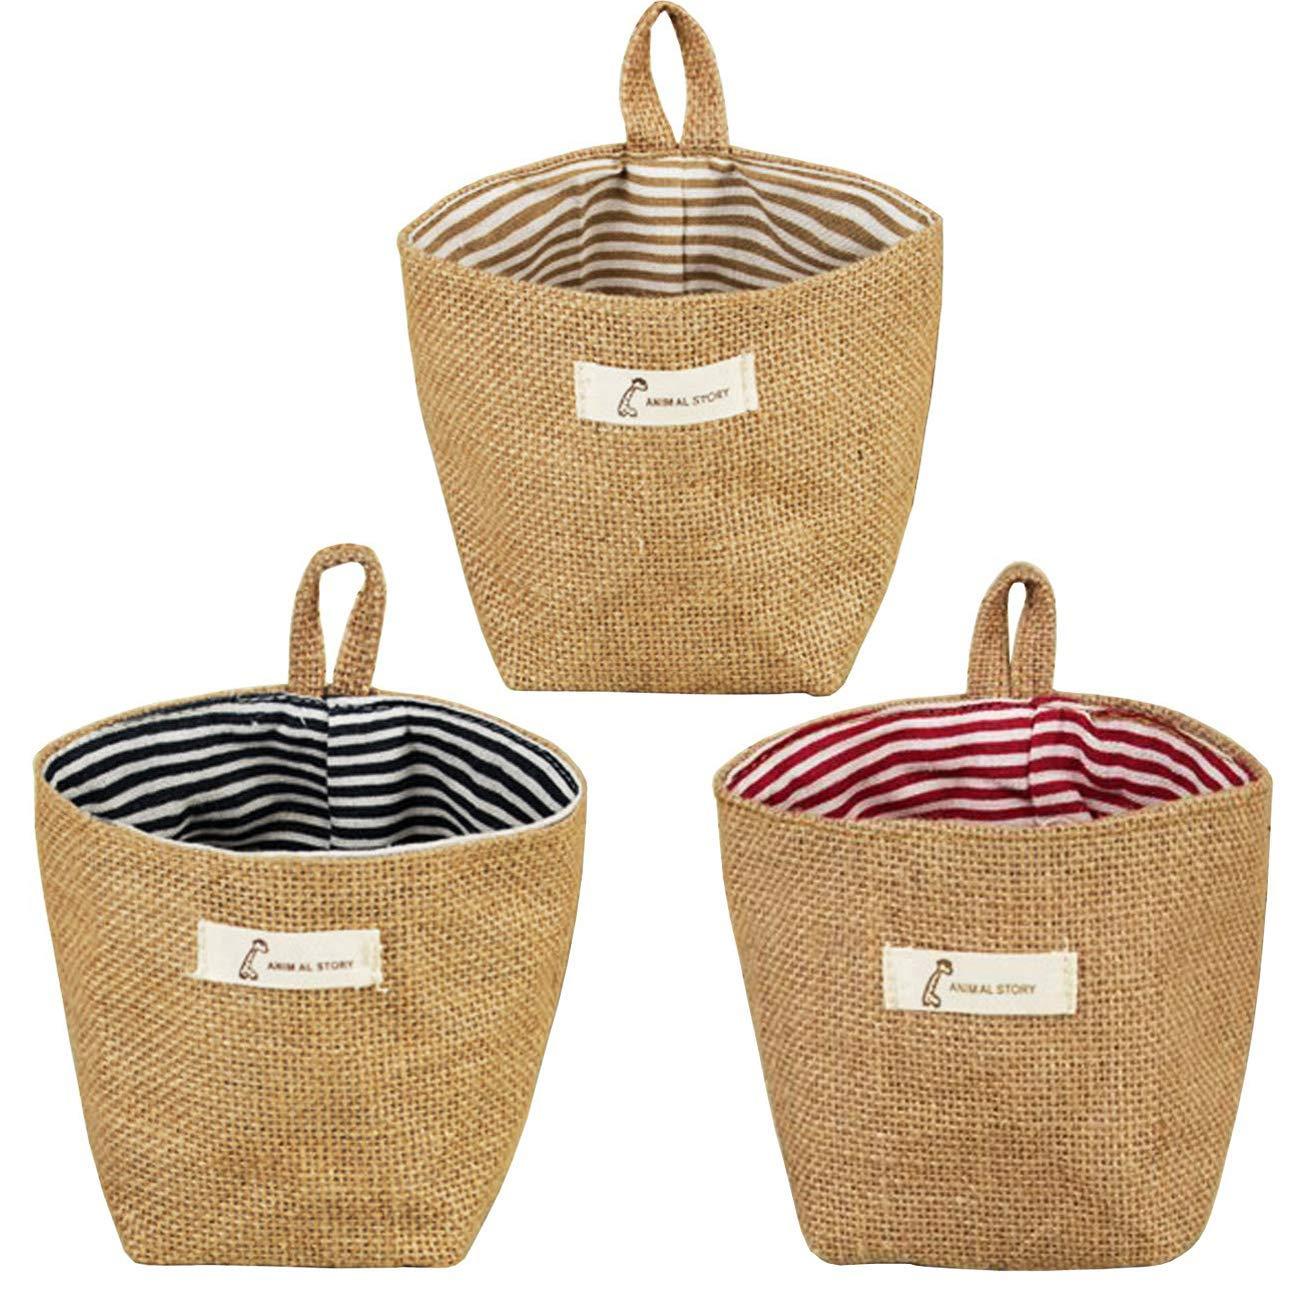 Acronde 3PCS Mini Hanging Storage Bag Cotton Linen Small Storage Basket Collapsible Convenient Decor Bin Bag for Room Wall Door Closet (Stripe)